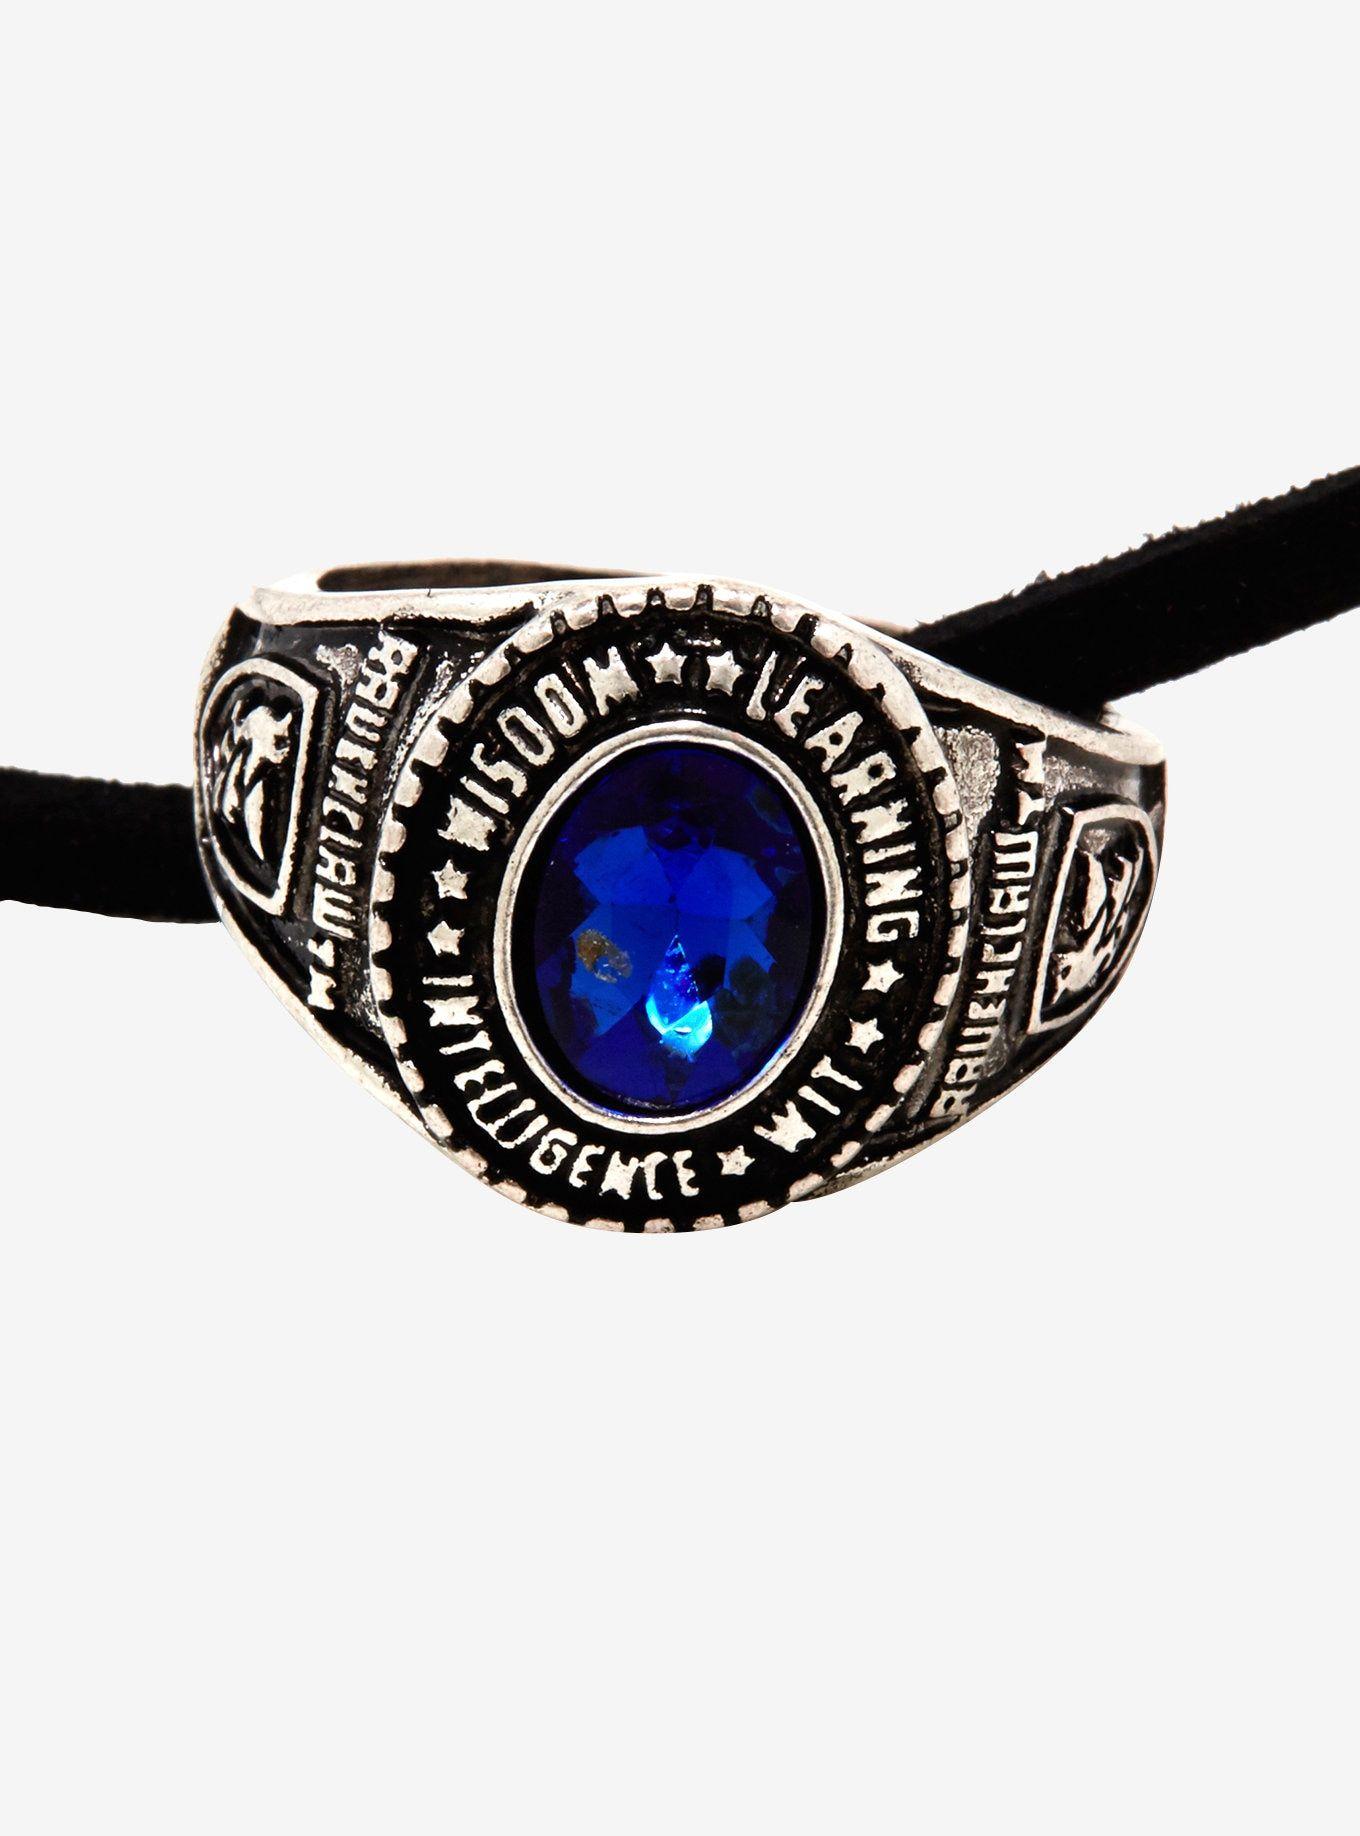 Harry Potter Ravenclaw Ring Necklace Harry potter